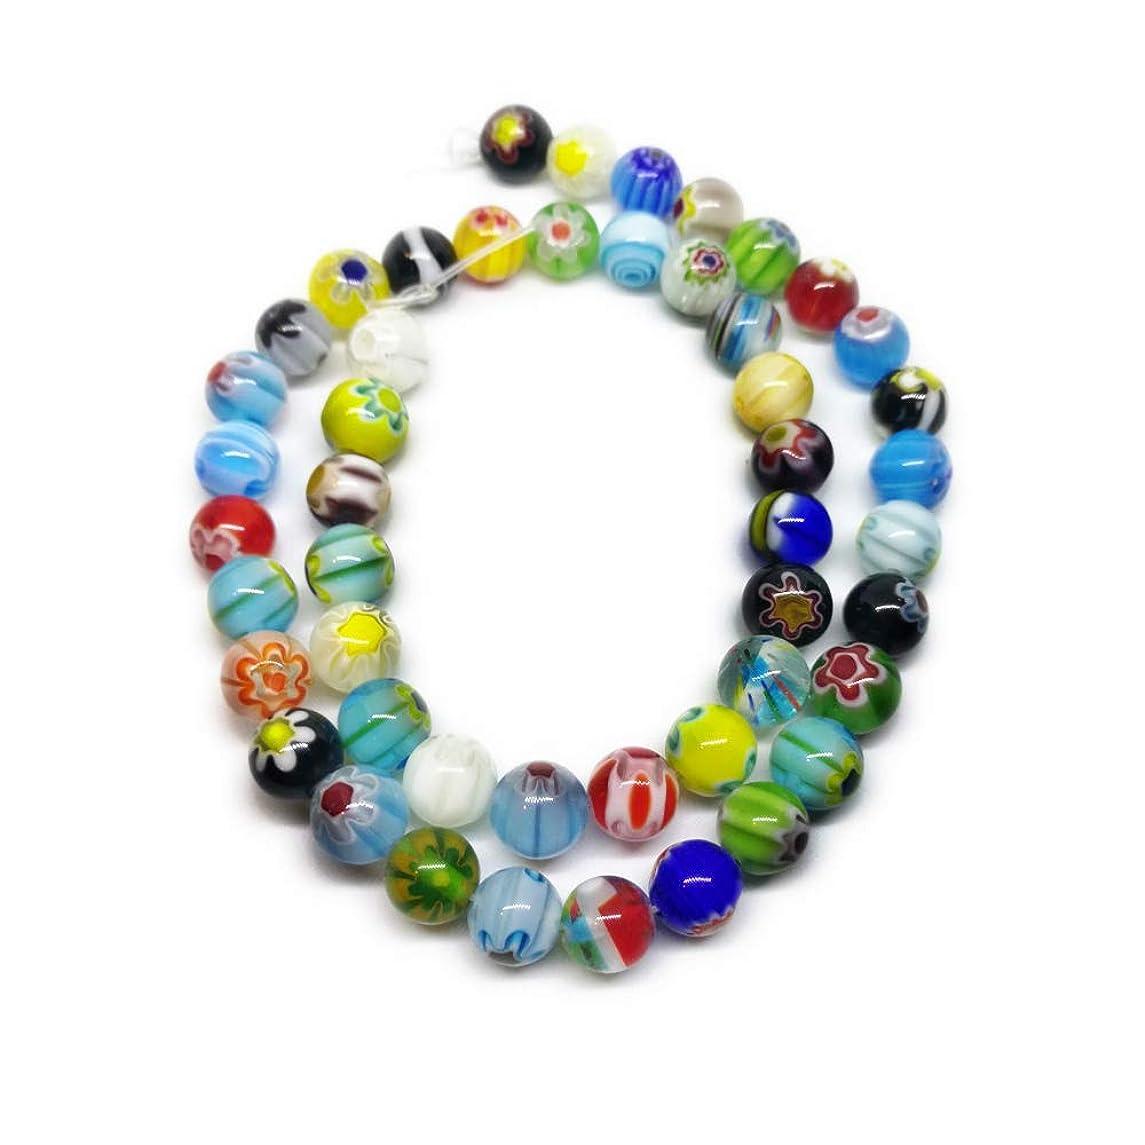 Millefiori Beads RAINBOW GLASS BEADS MIX 8mm 140 Beads 100 Grams